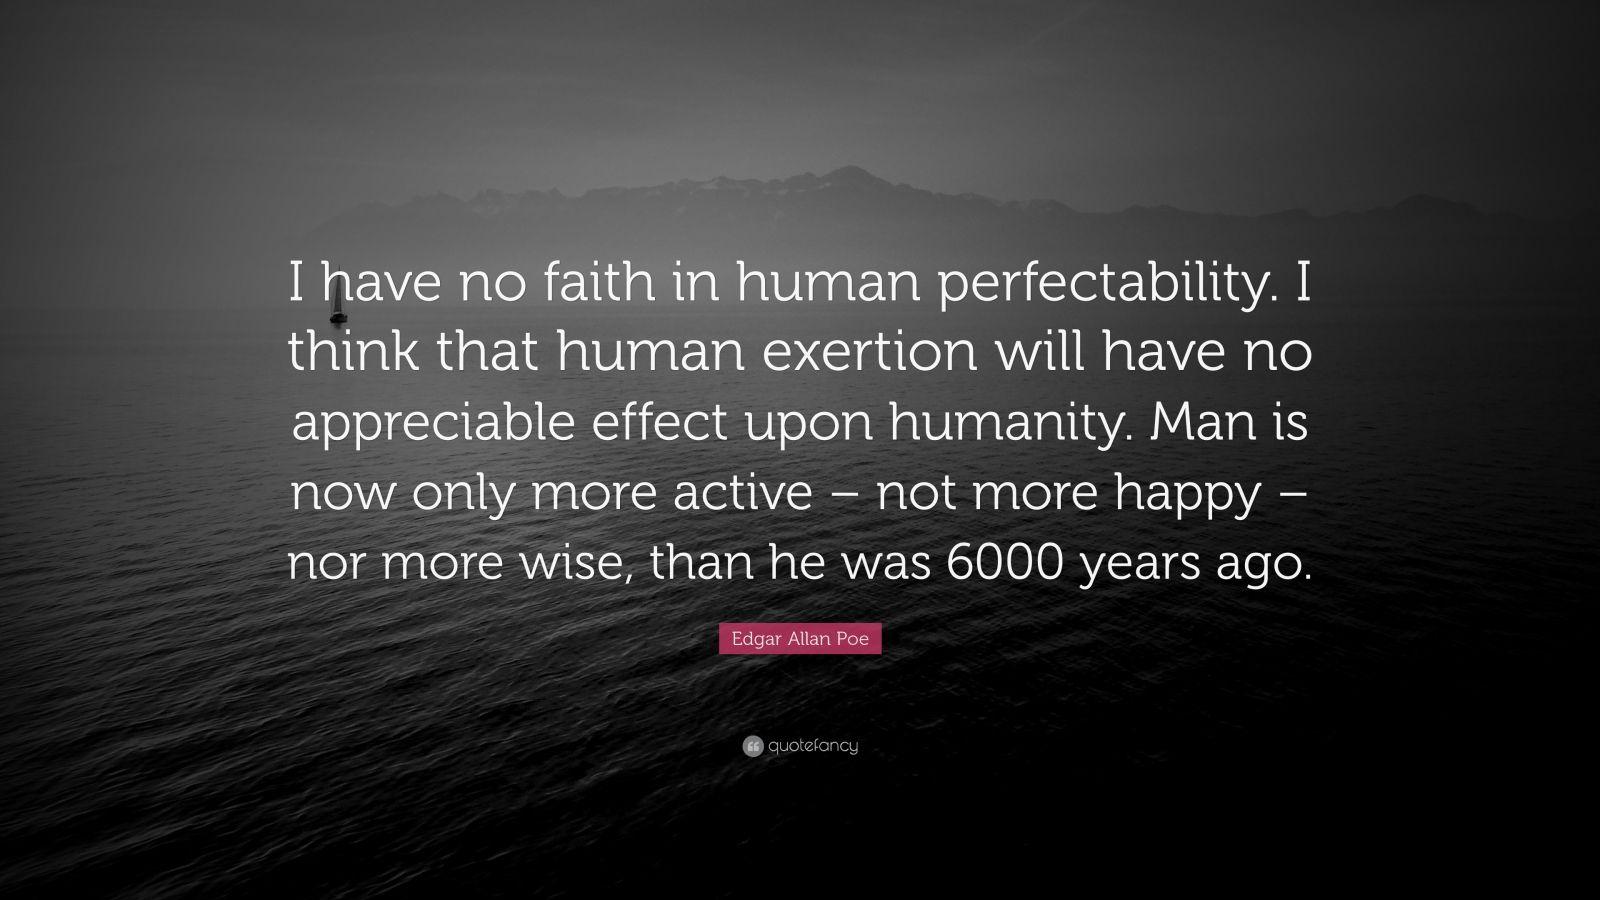 Edgar Allan Poe Life Quotes Edgar Allan Poe Quotes 100 Wallpapers  Quotefancy